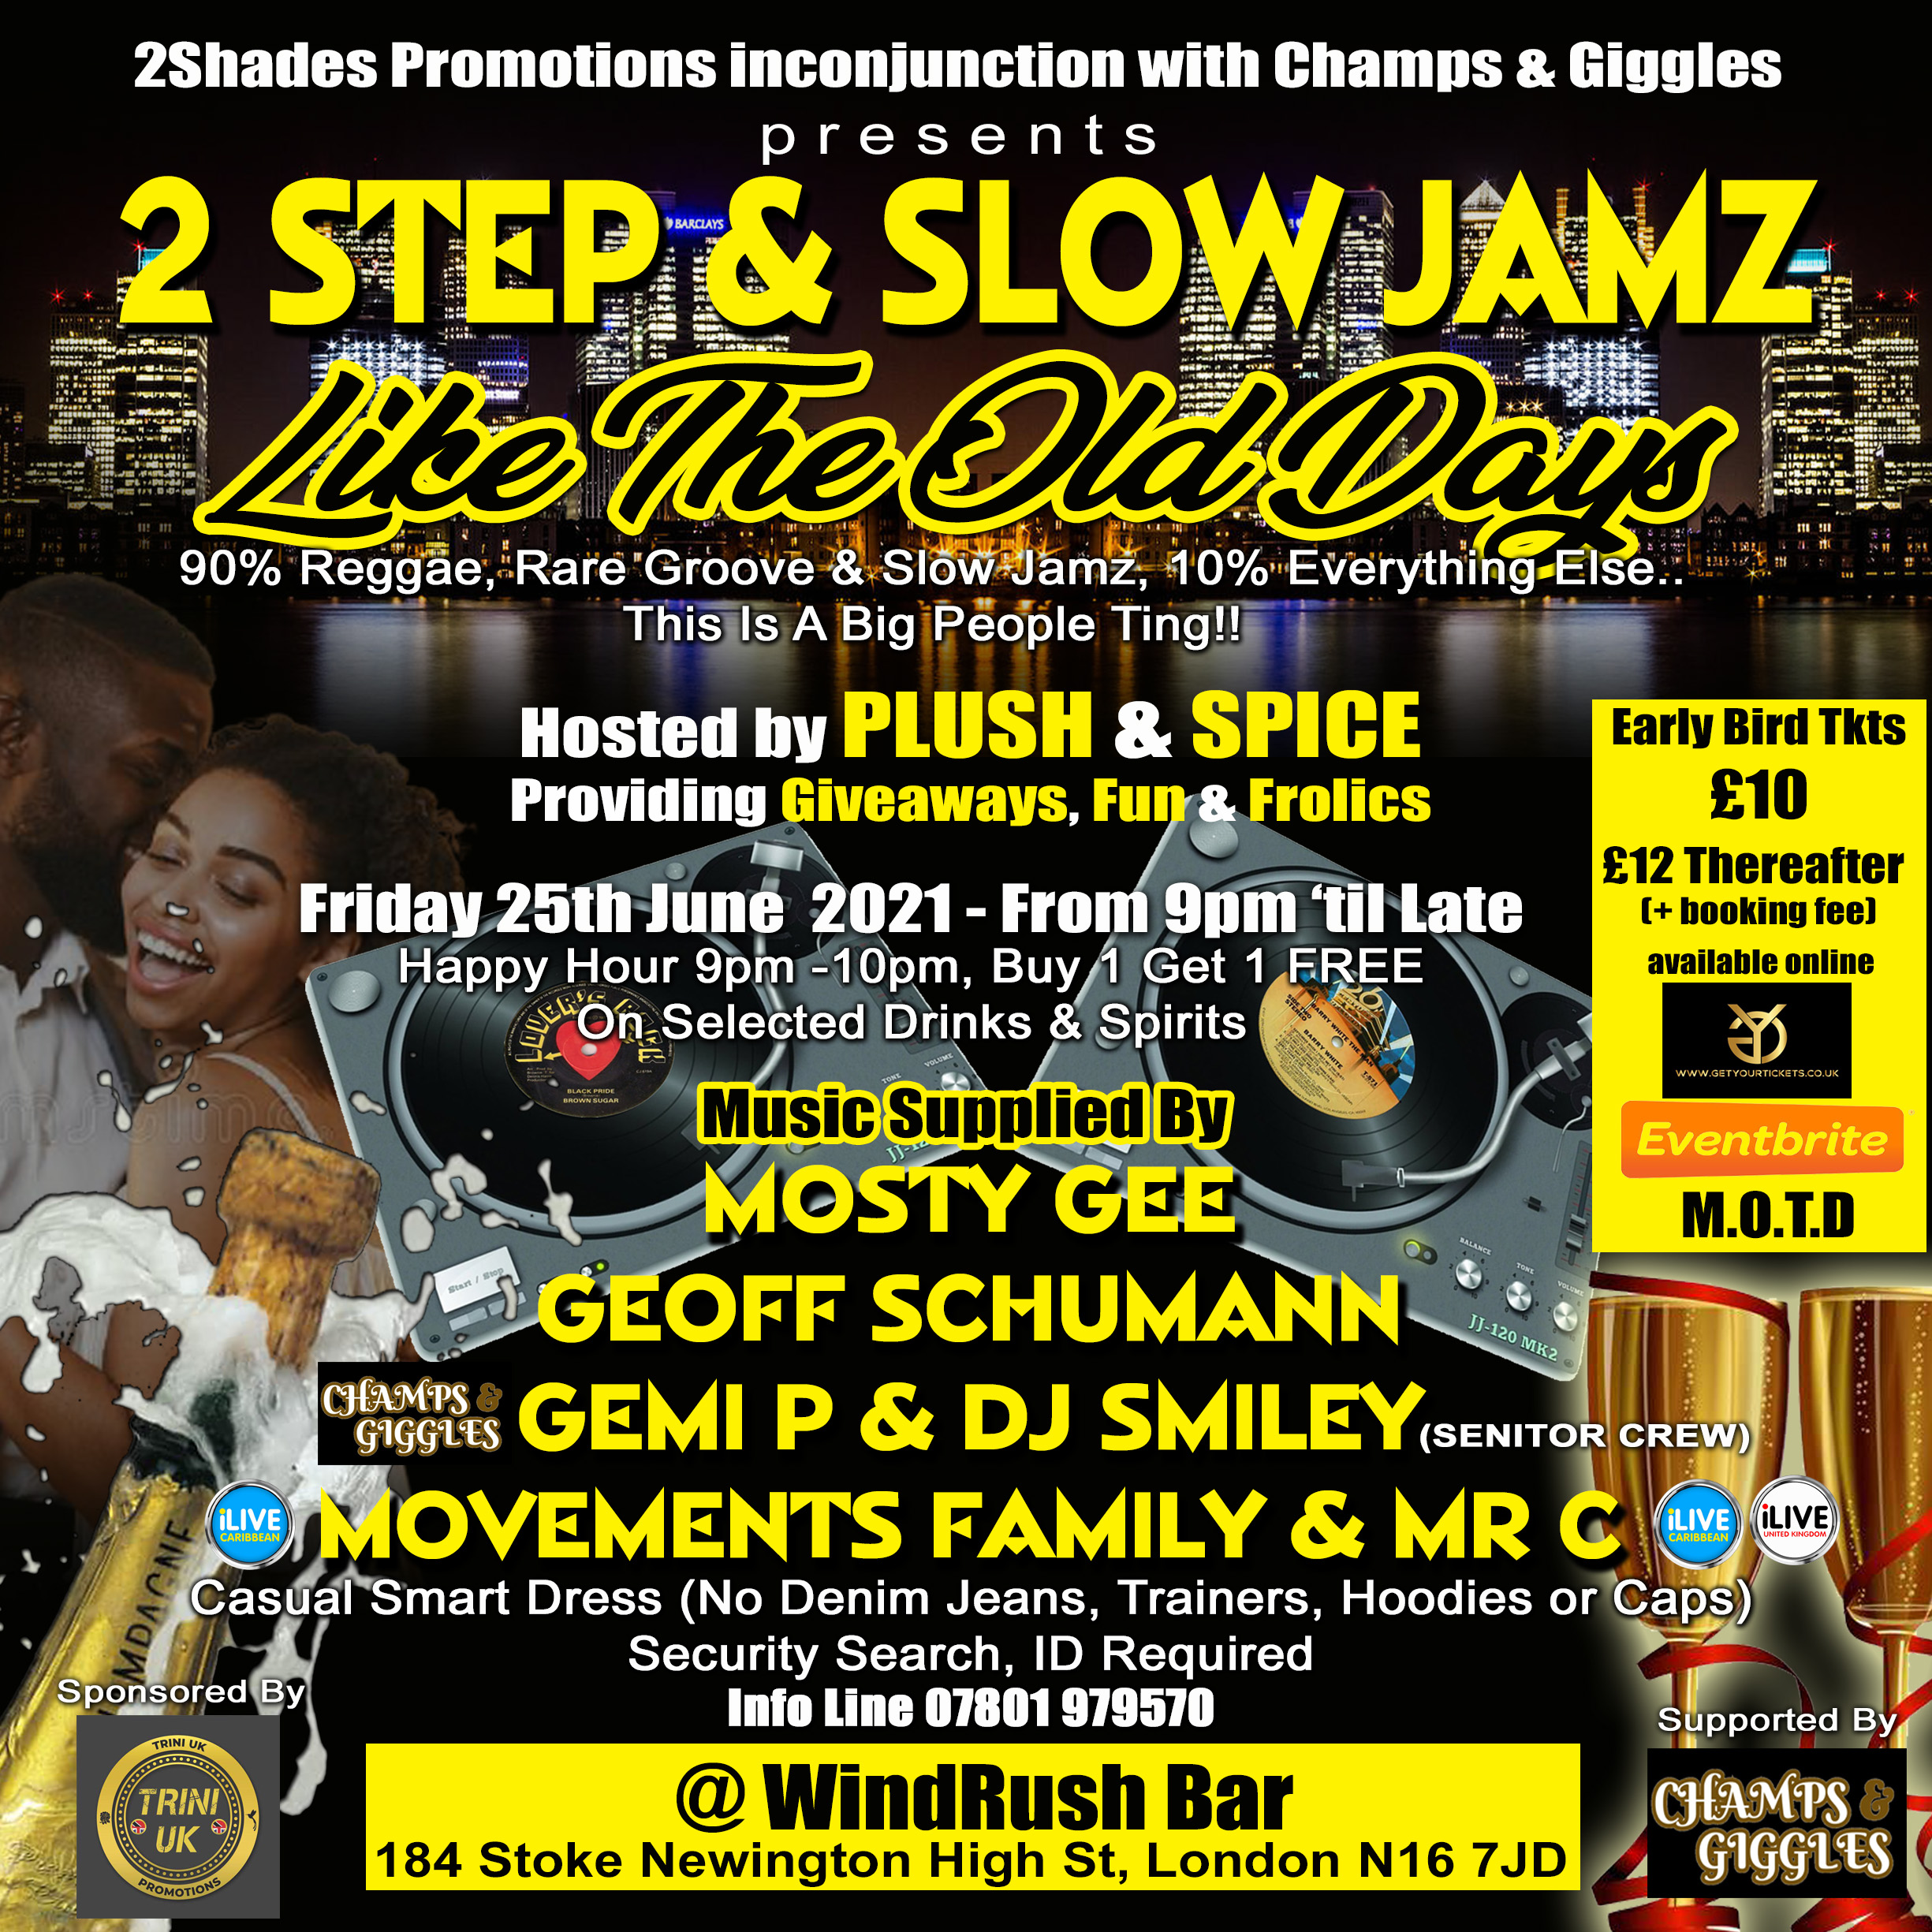 2 STEP & SLOW JAMZ, Like The Old Days